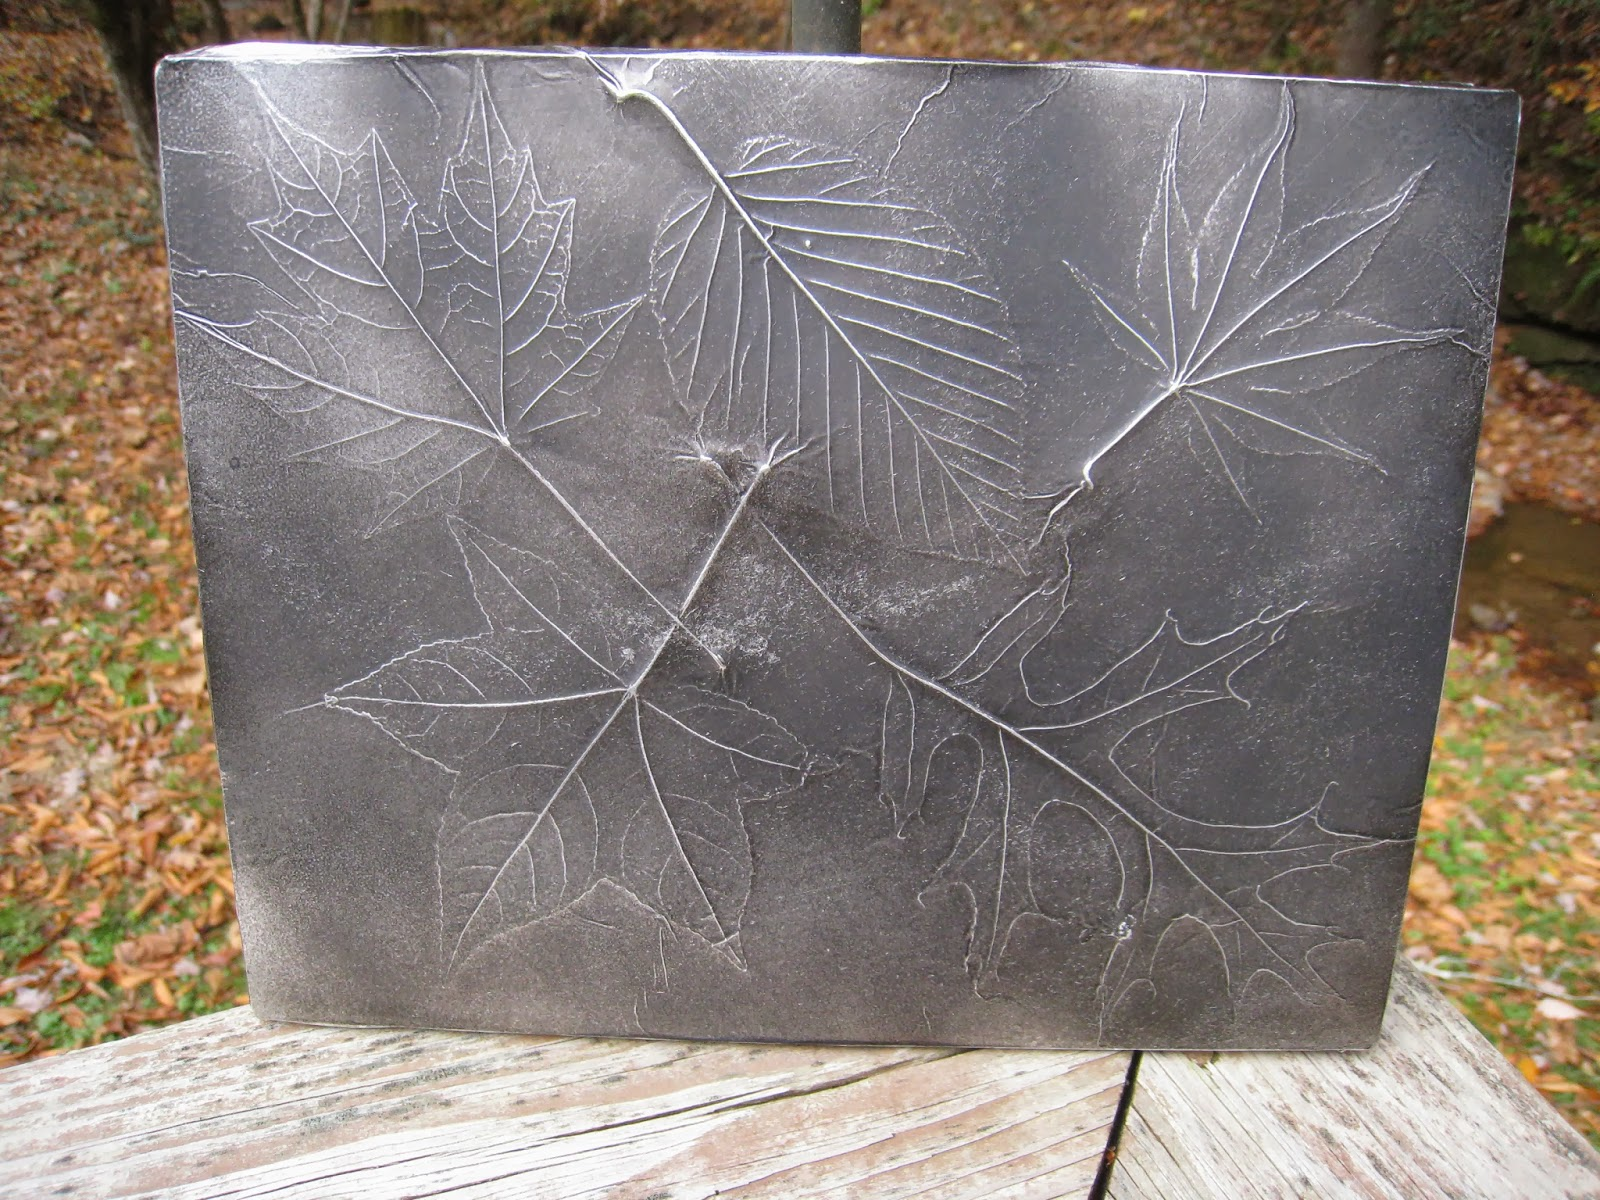 Crafts 4 Camp Foil Relief Art